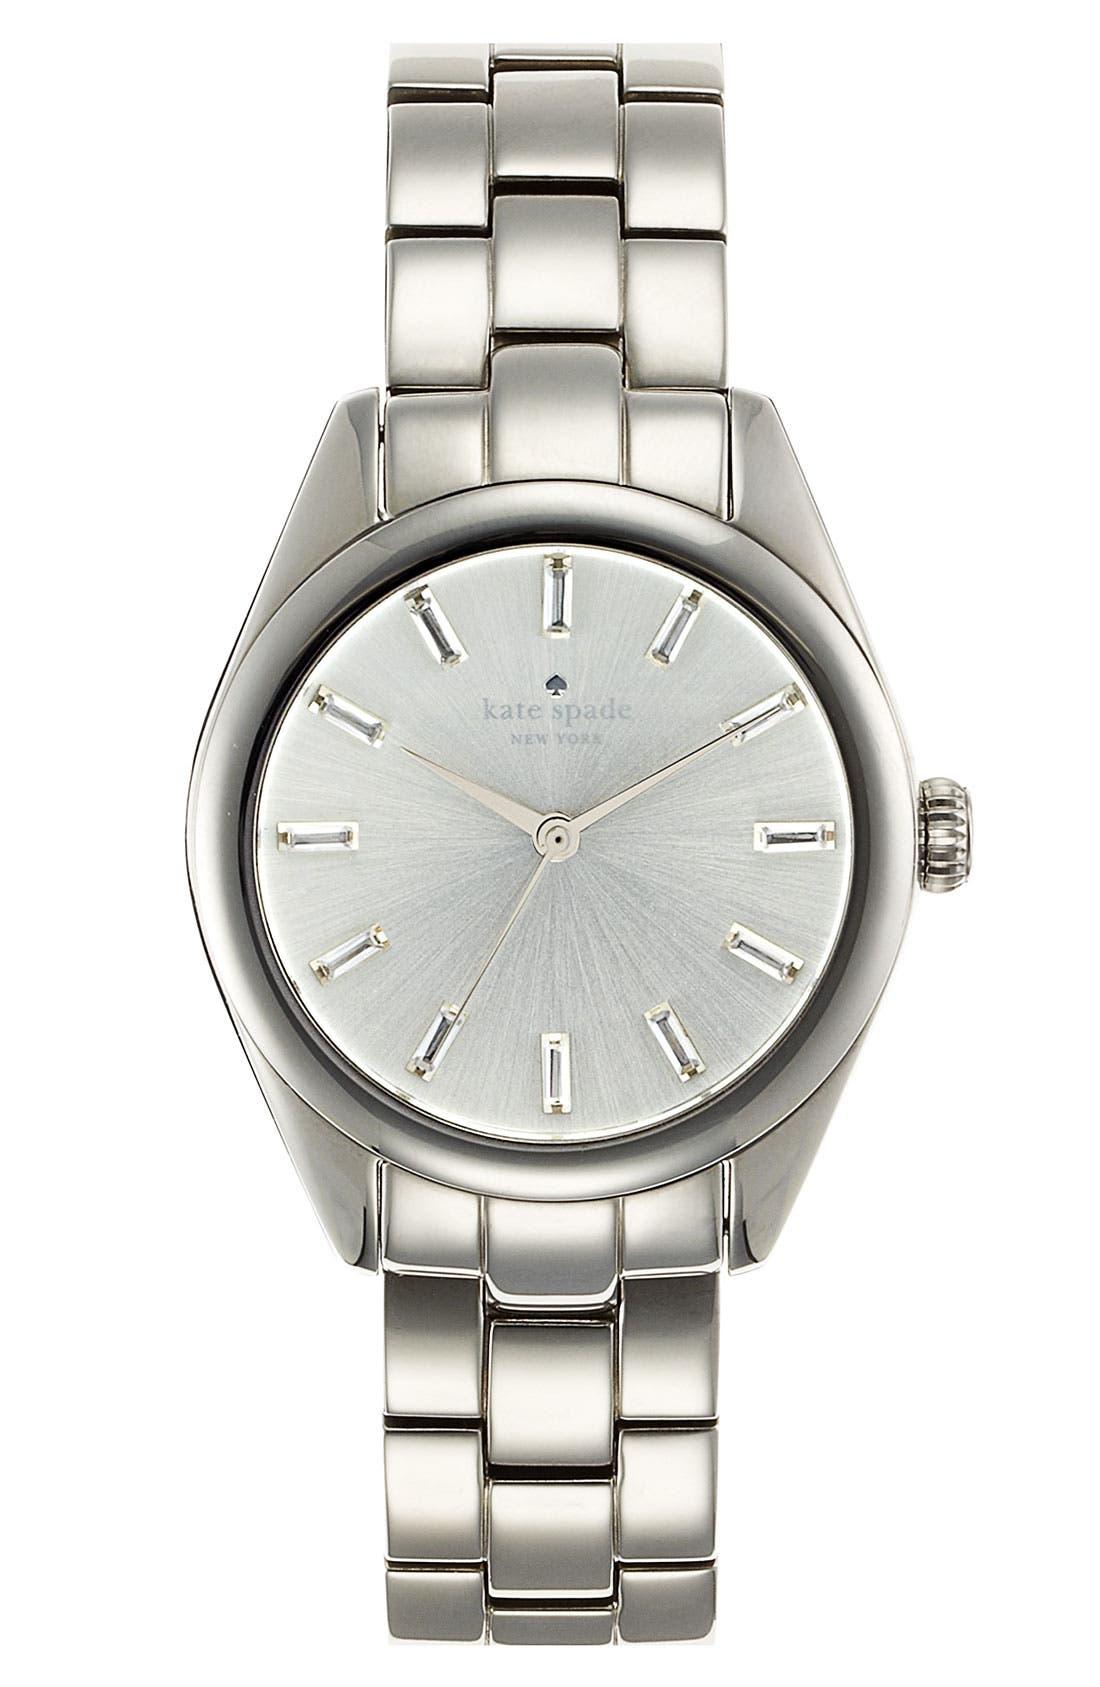 Main Image - kate spade new york 'seaport' bracelet watch, 34mm